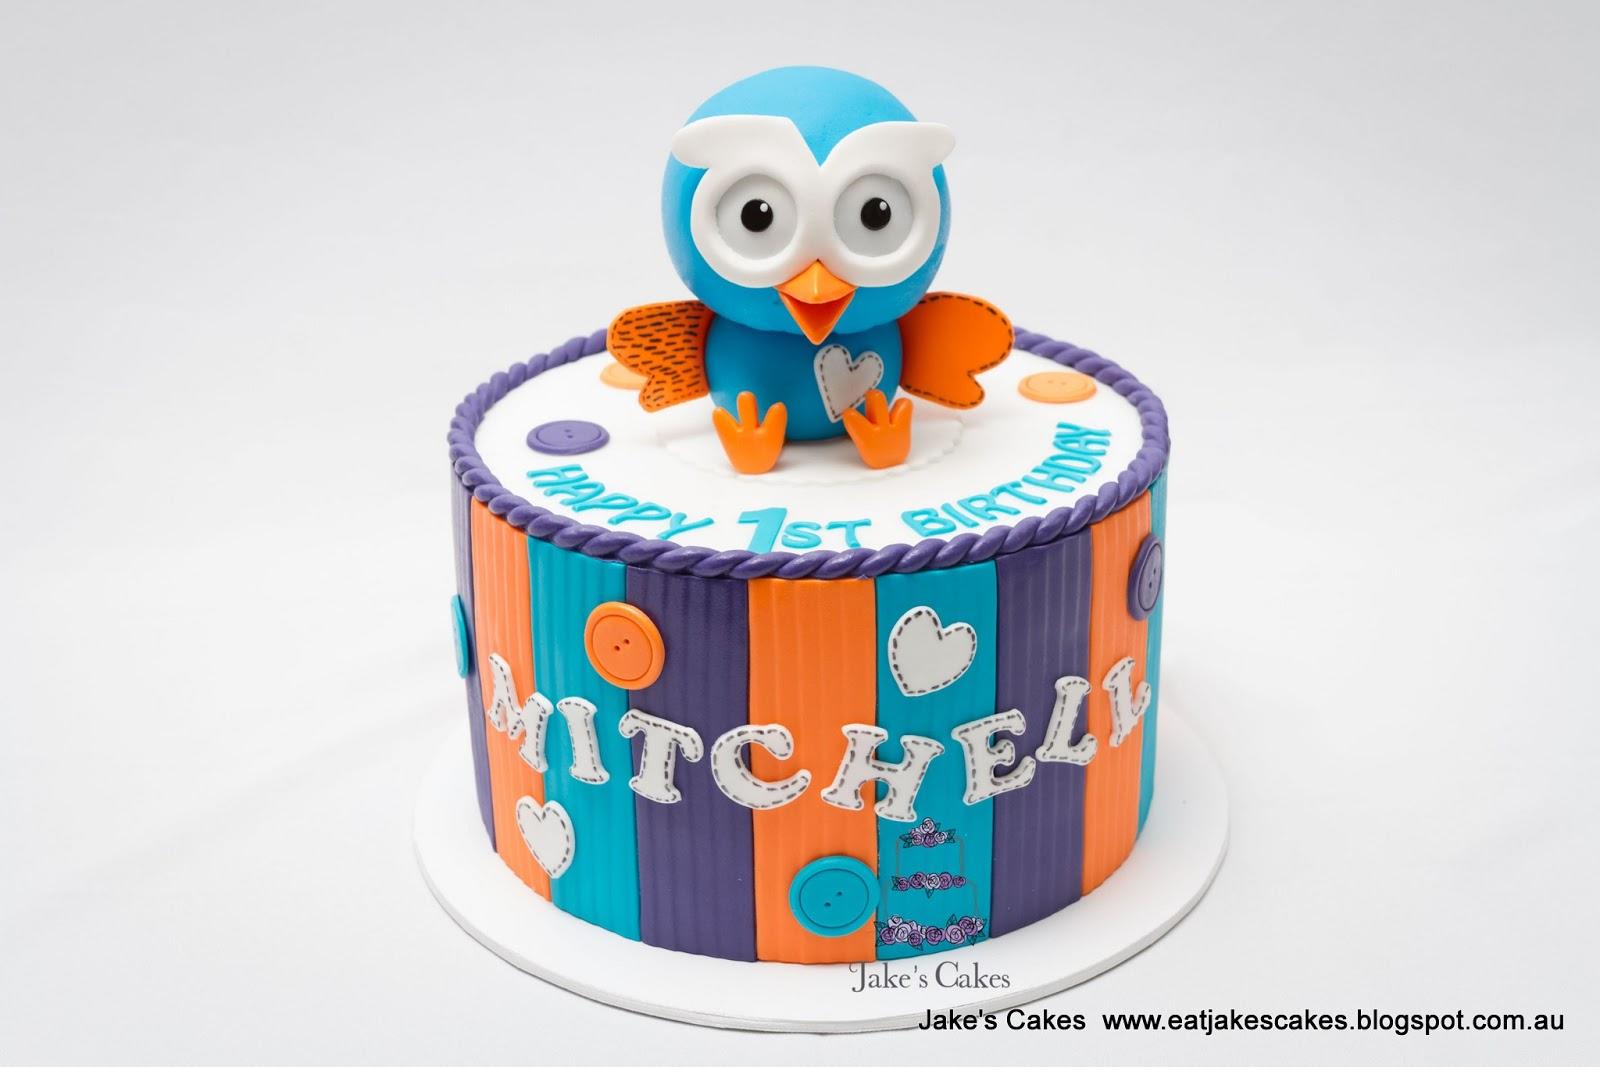 Jakes Cakes Hoot 1st Birthday Cake